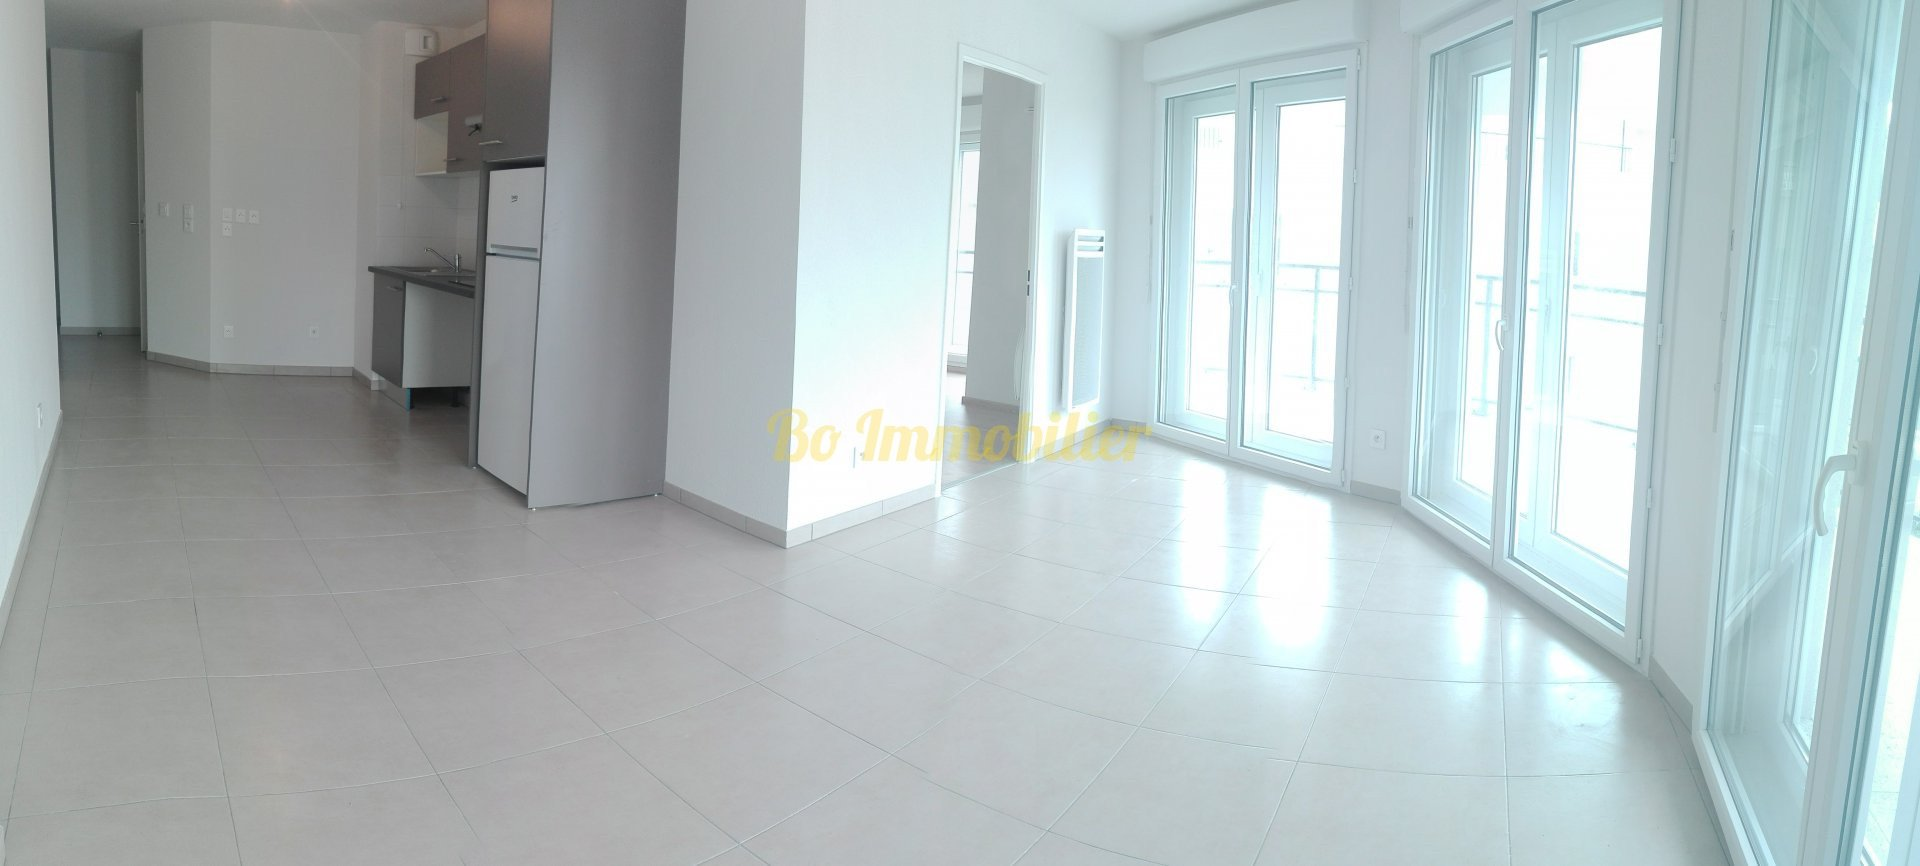 Appart Neuf, beau 3p de 61 m² + terrasse de 17 m² + 2 parkings